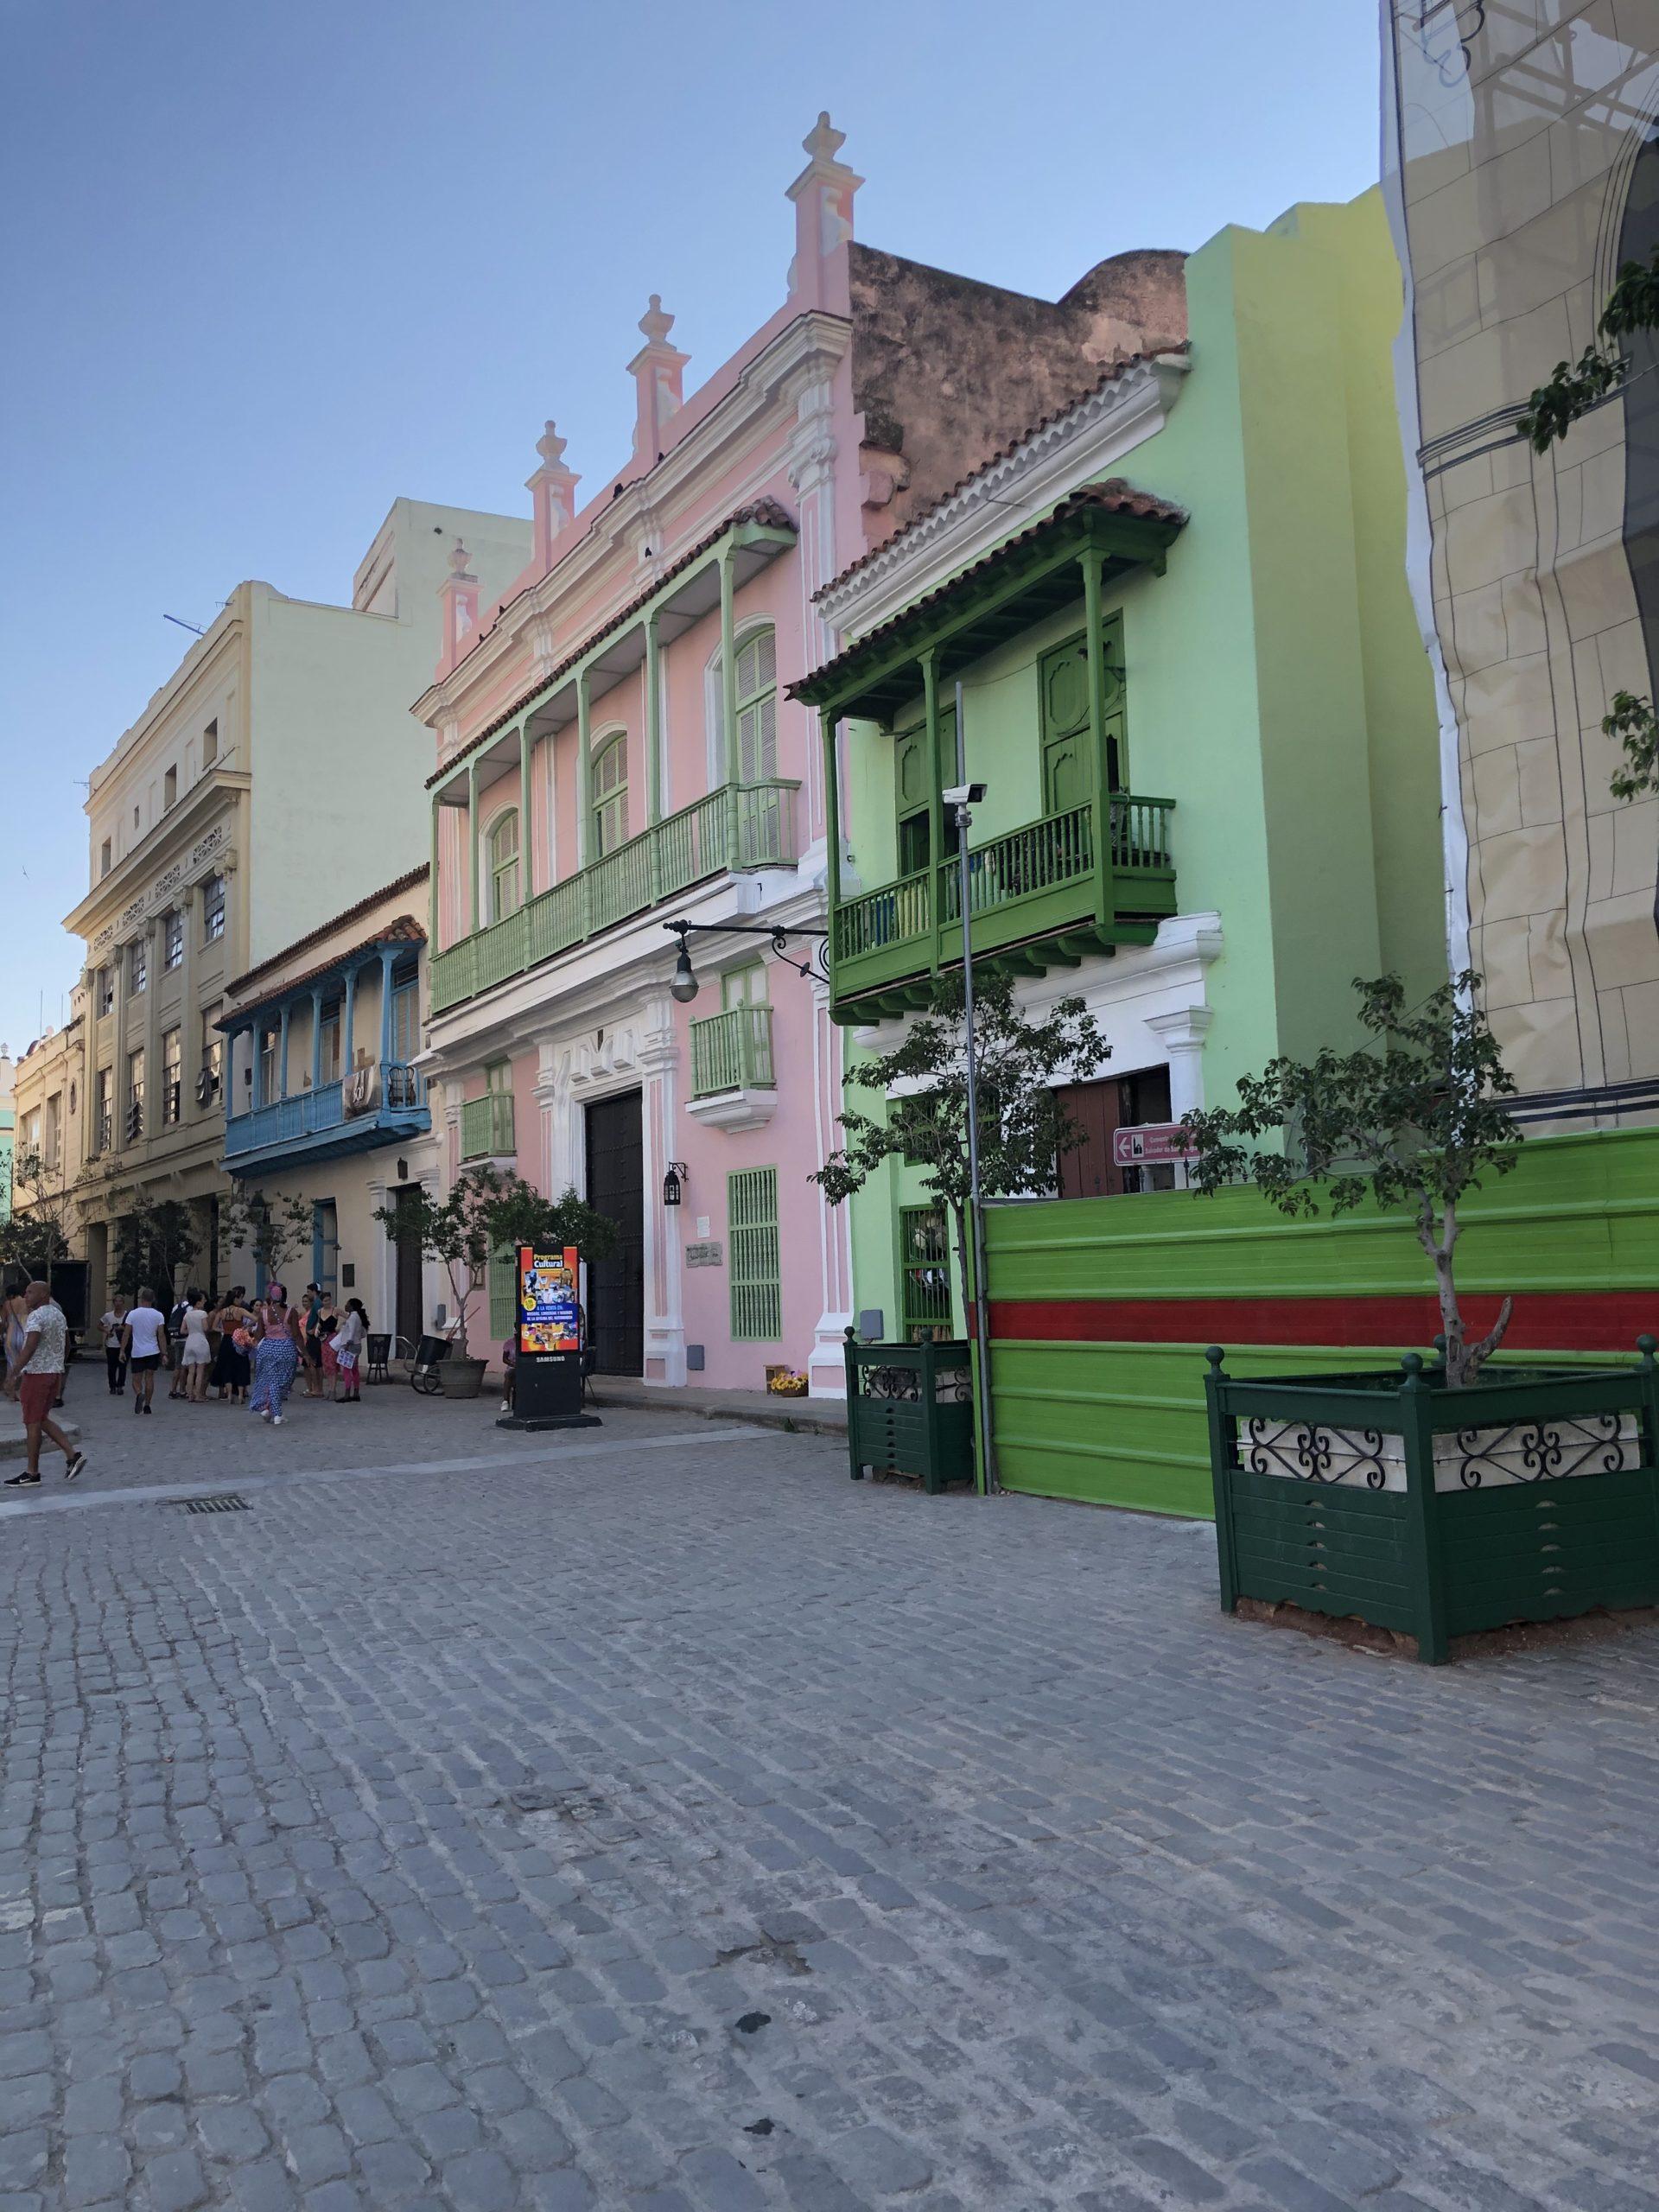 ADAC-Reiseführer Kuba-Bunte Perle der KaribikHavanna Rundgang